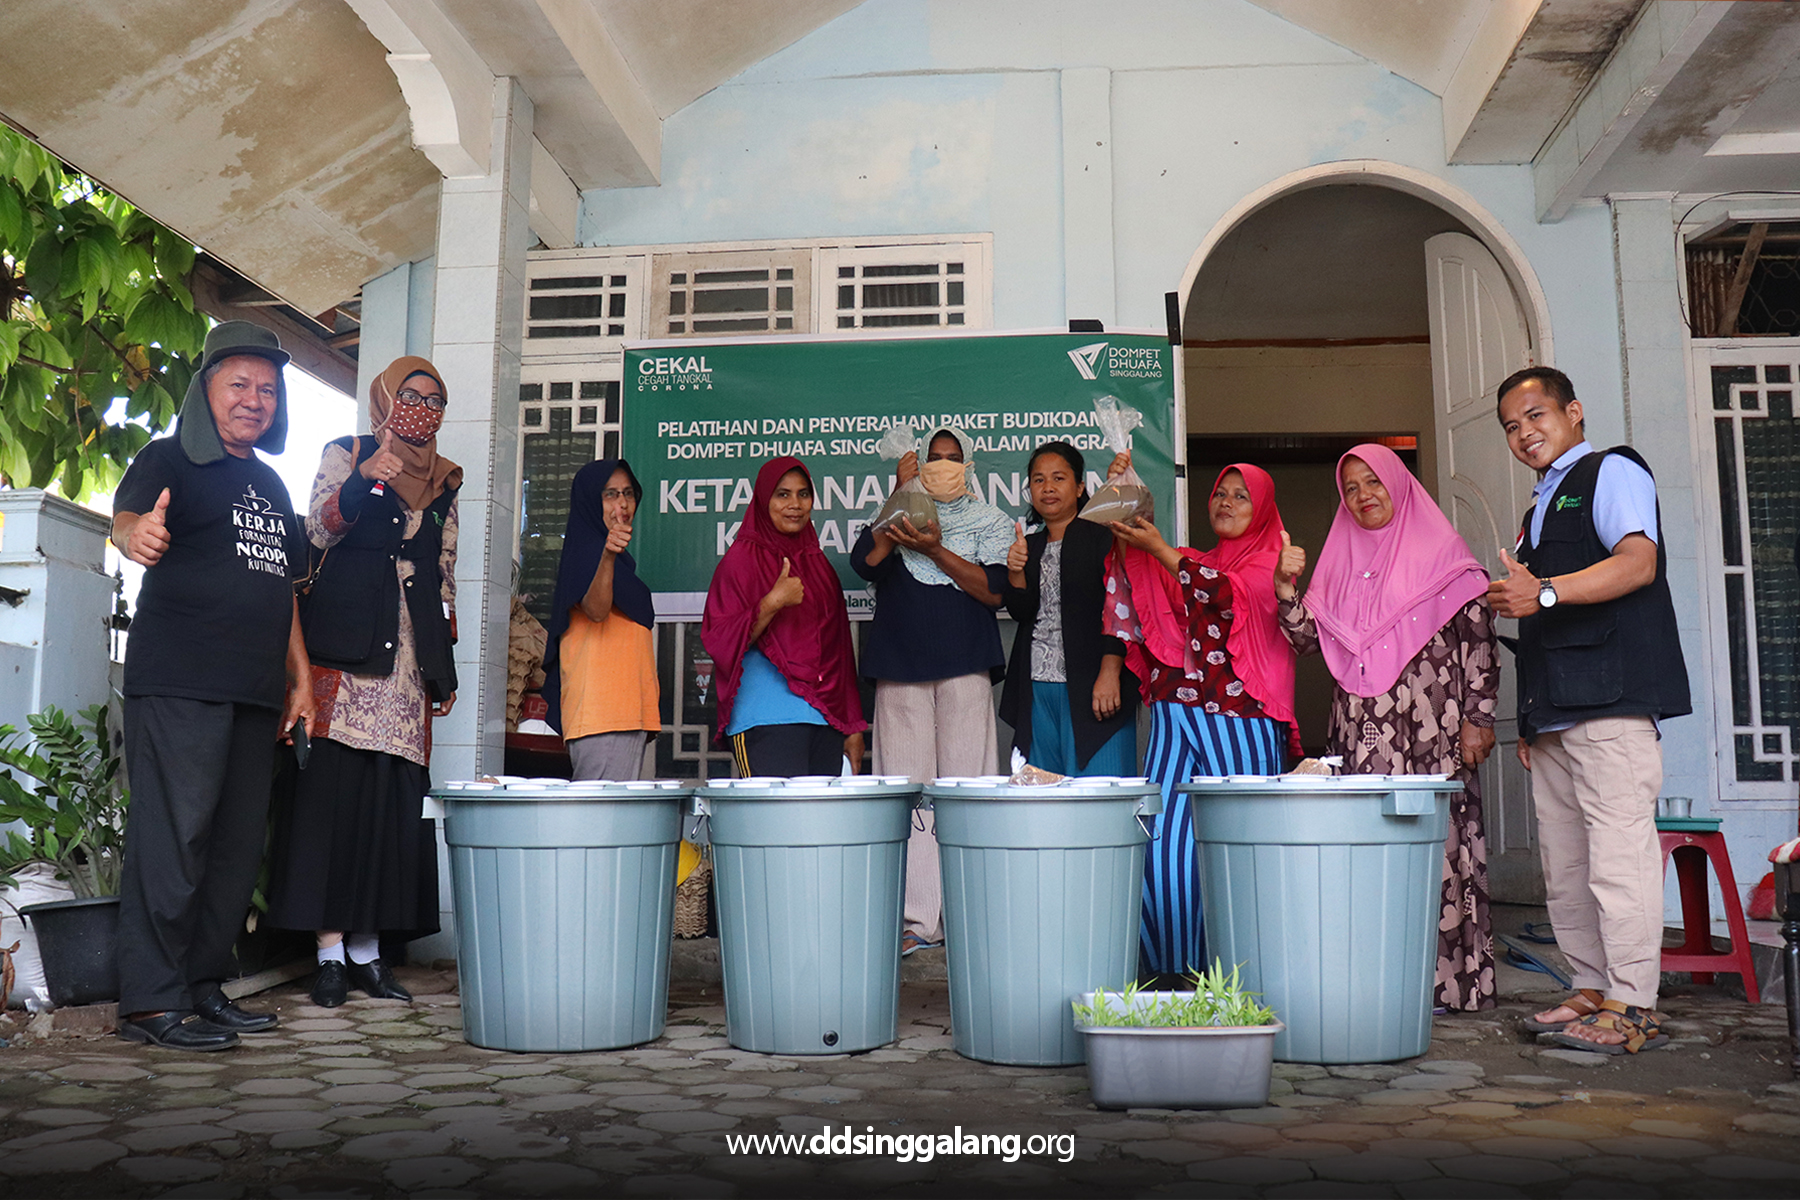 DD Singgalang Launching Program KPK untuk Penuhi Nutrisi Keluarga